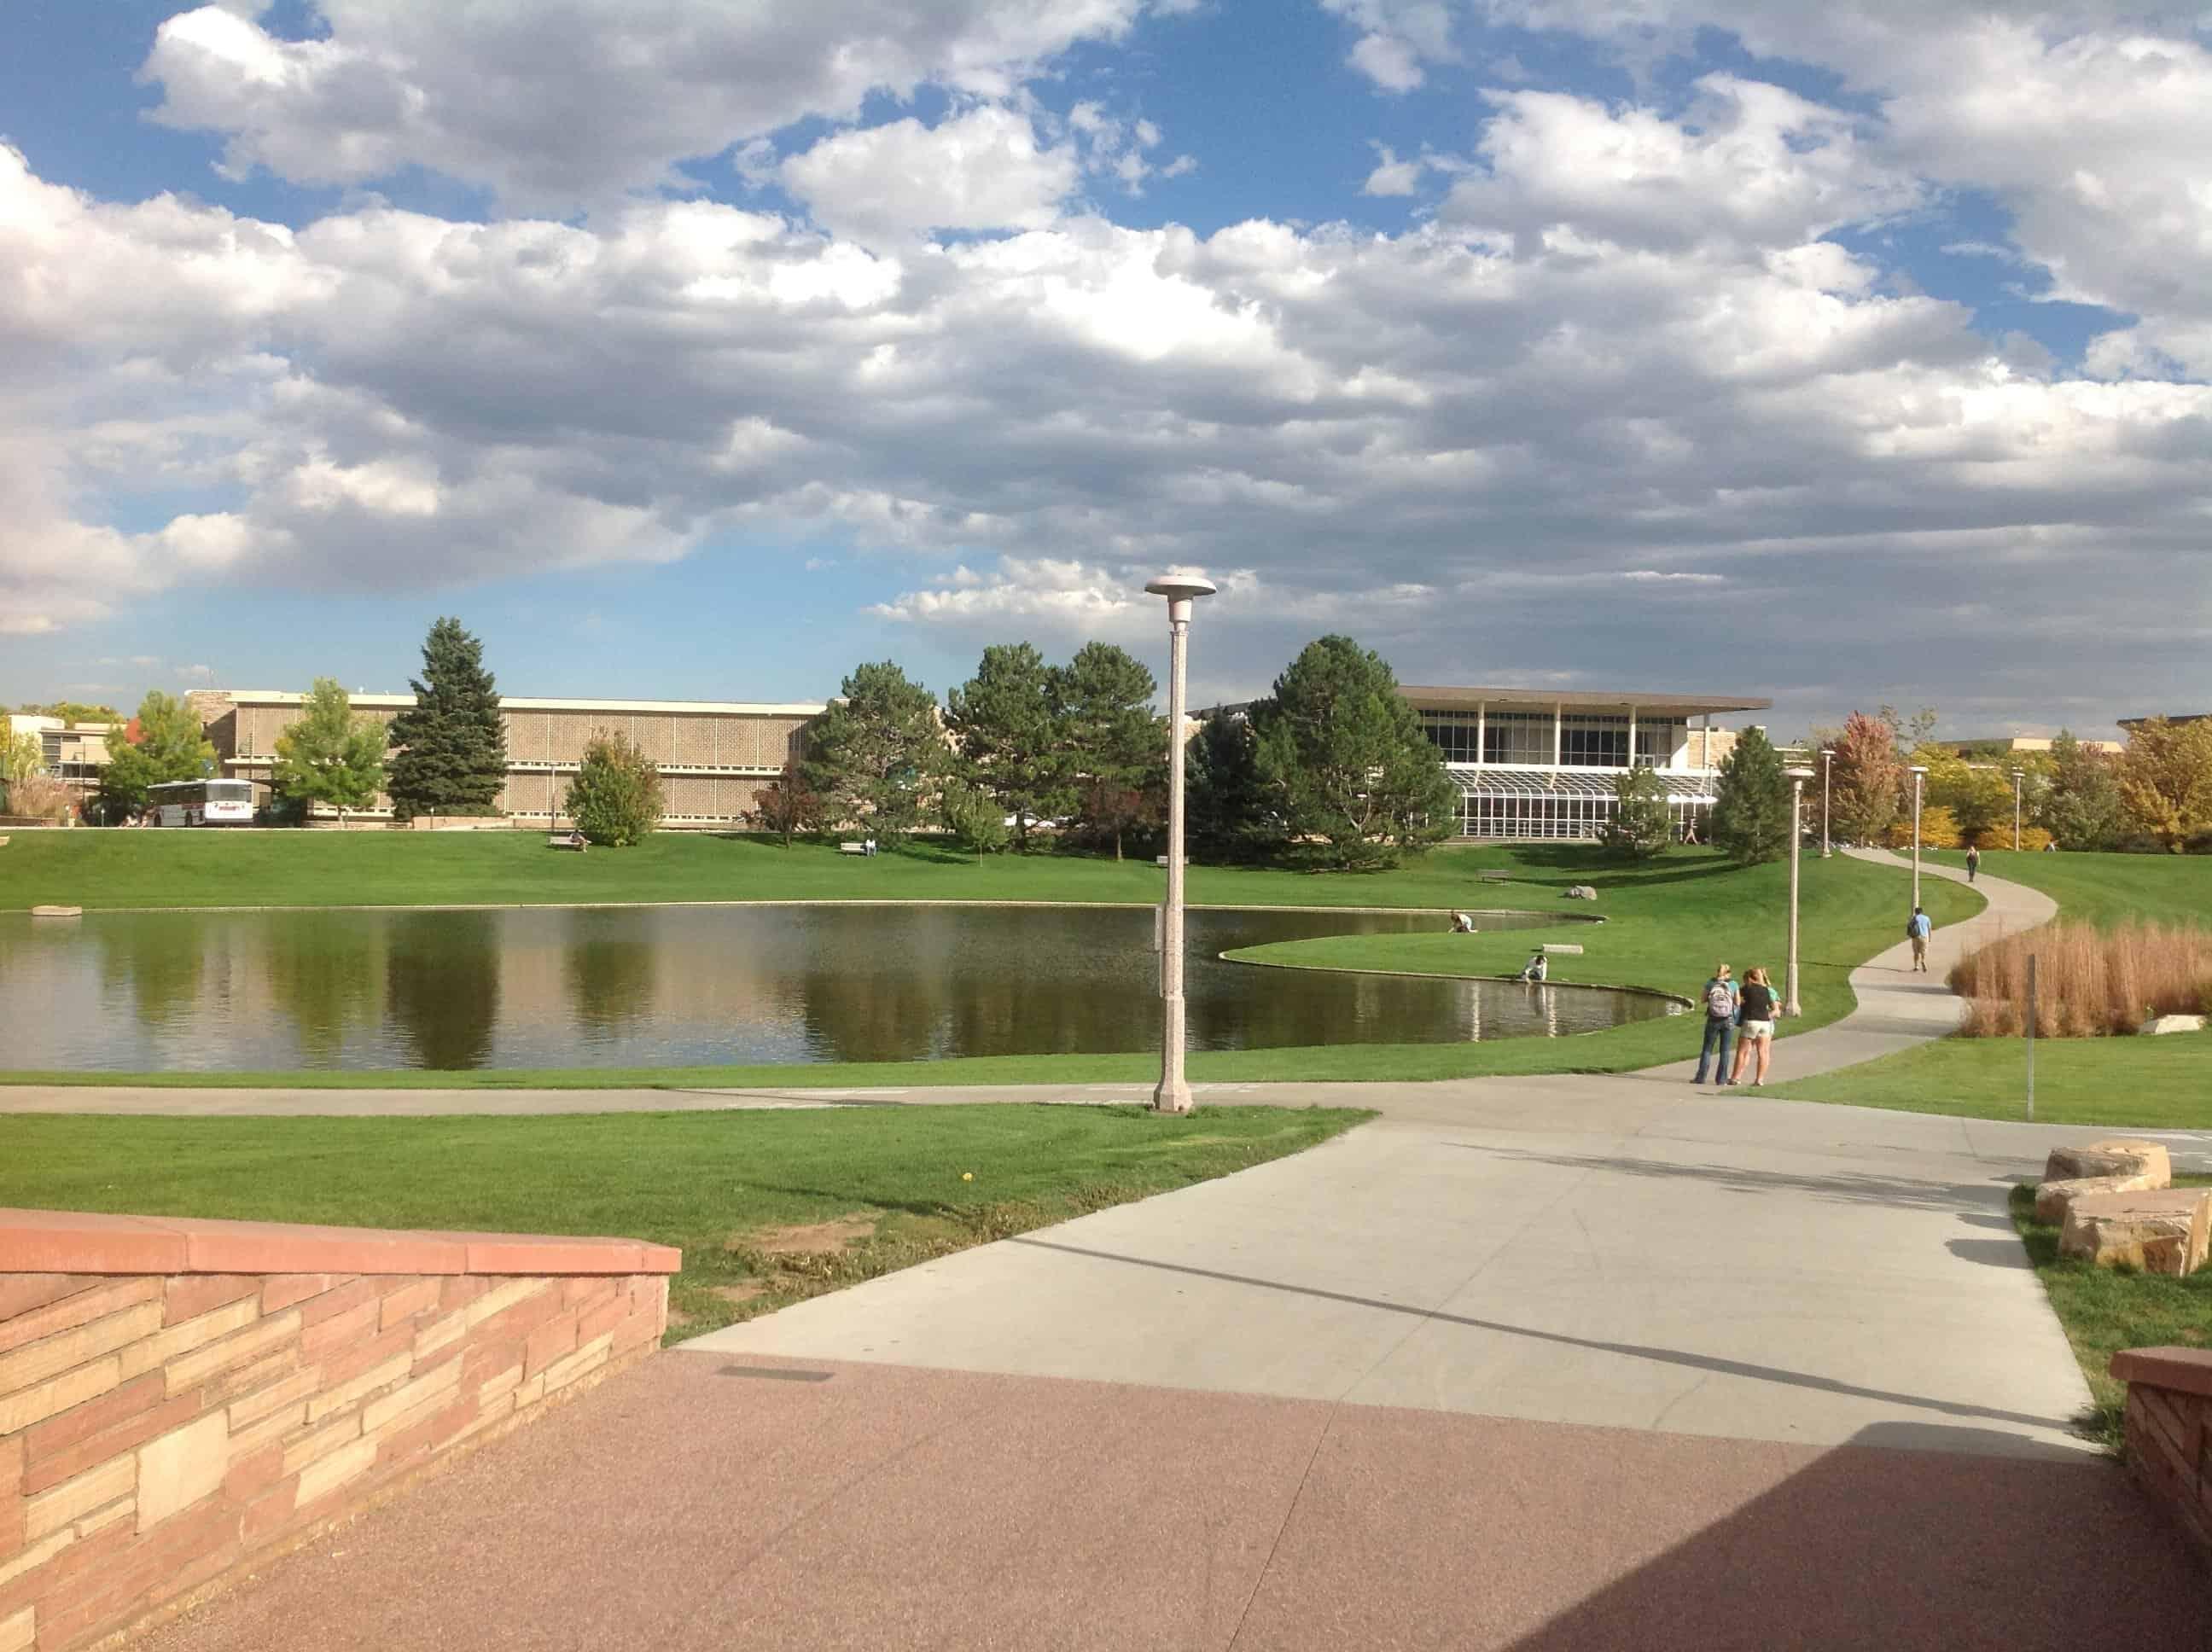 Colo State campus - lake